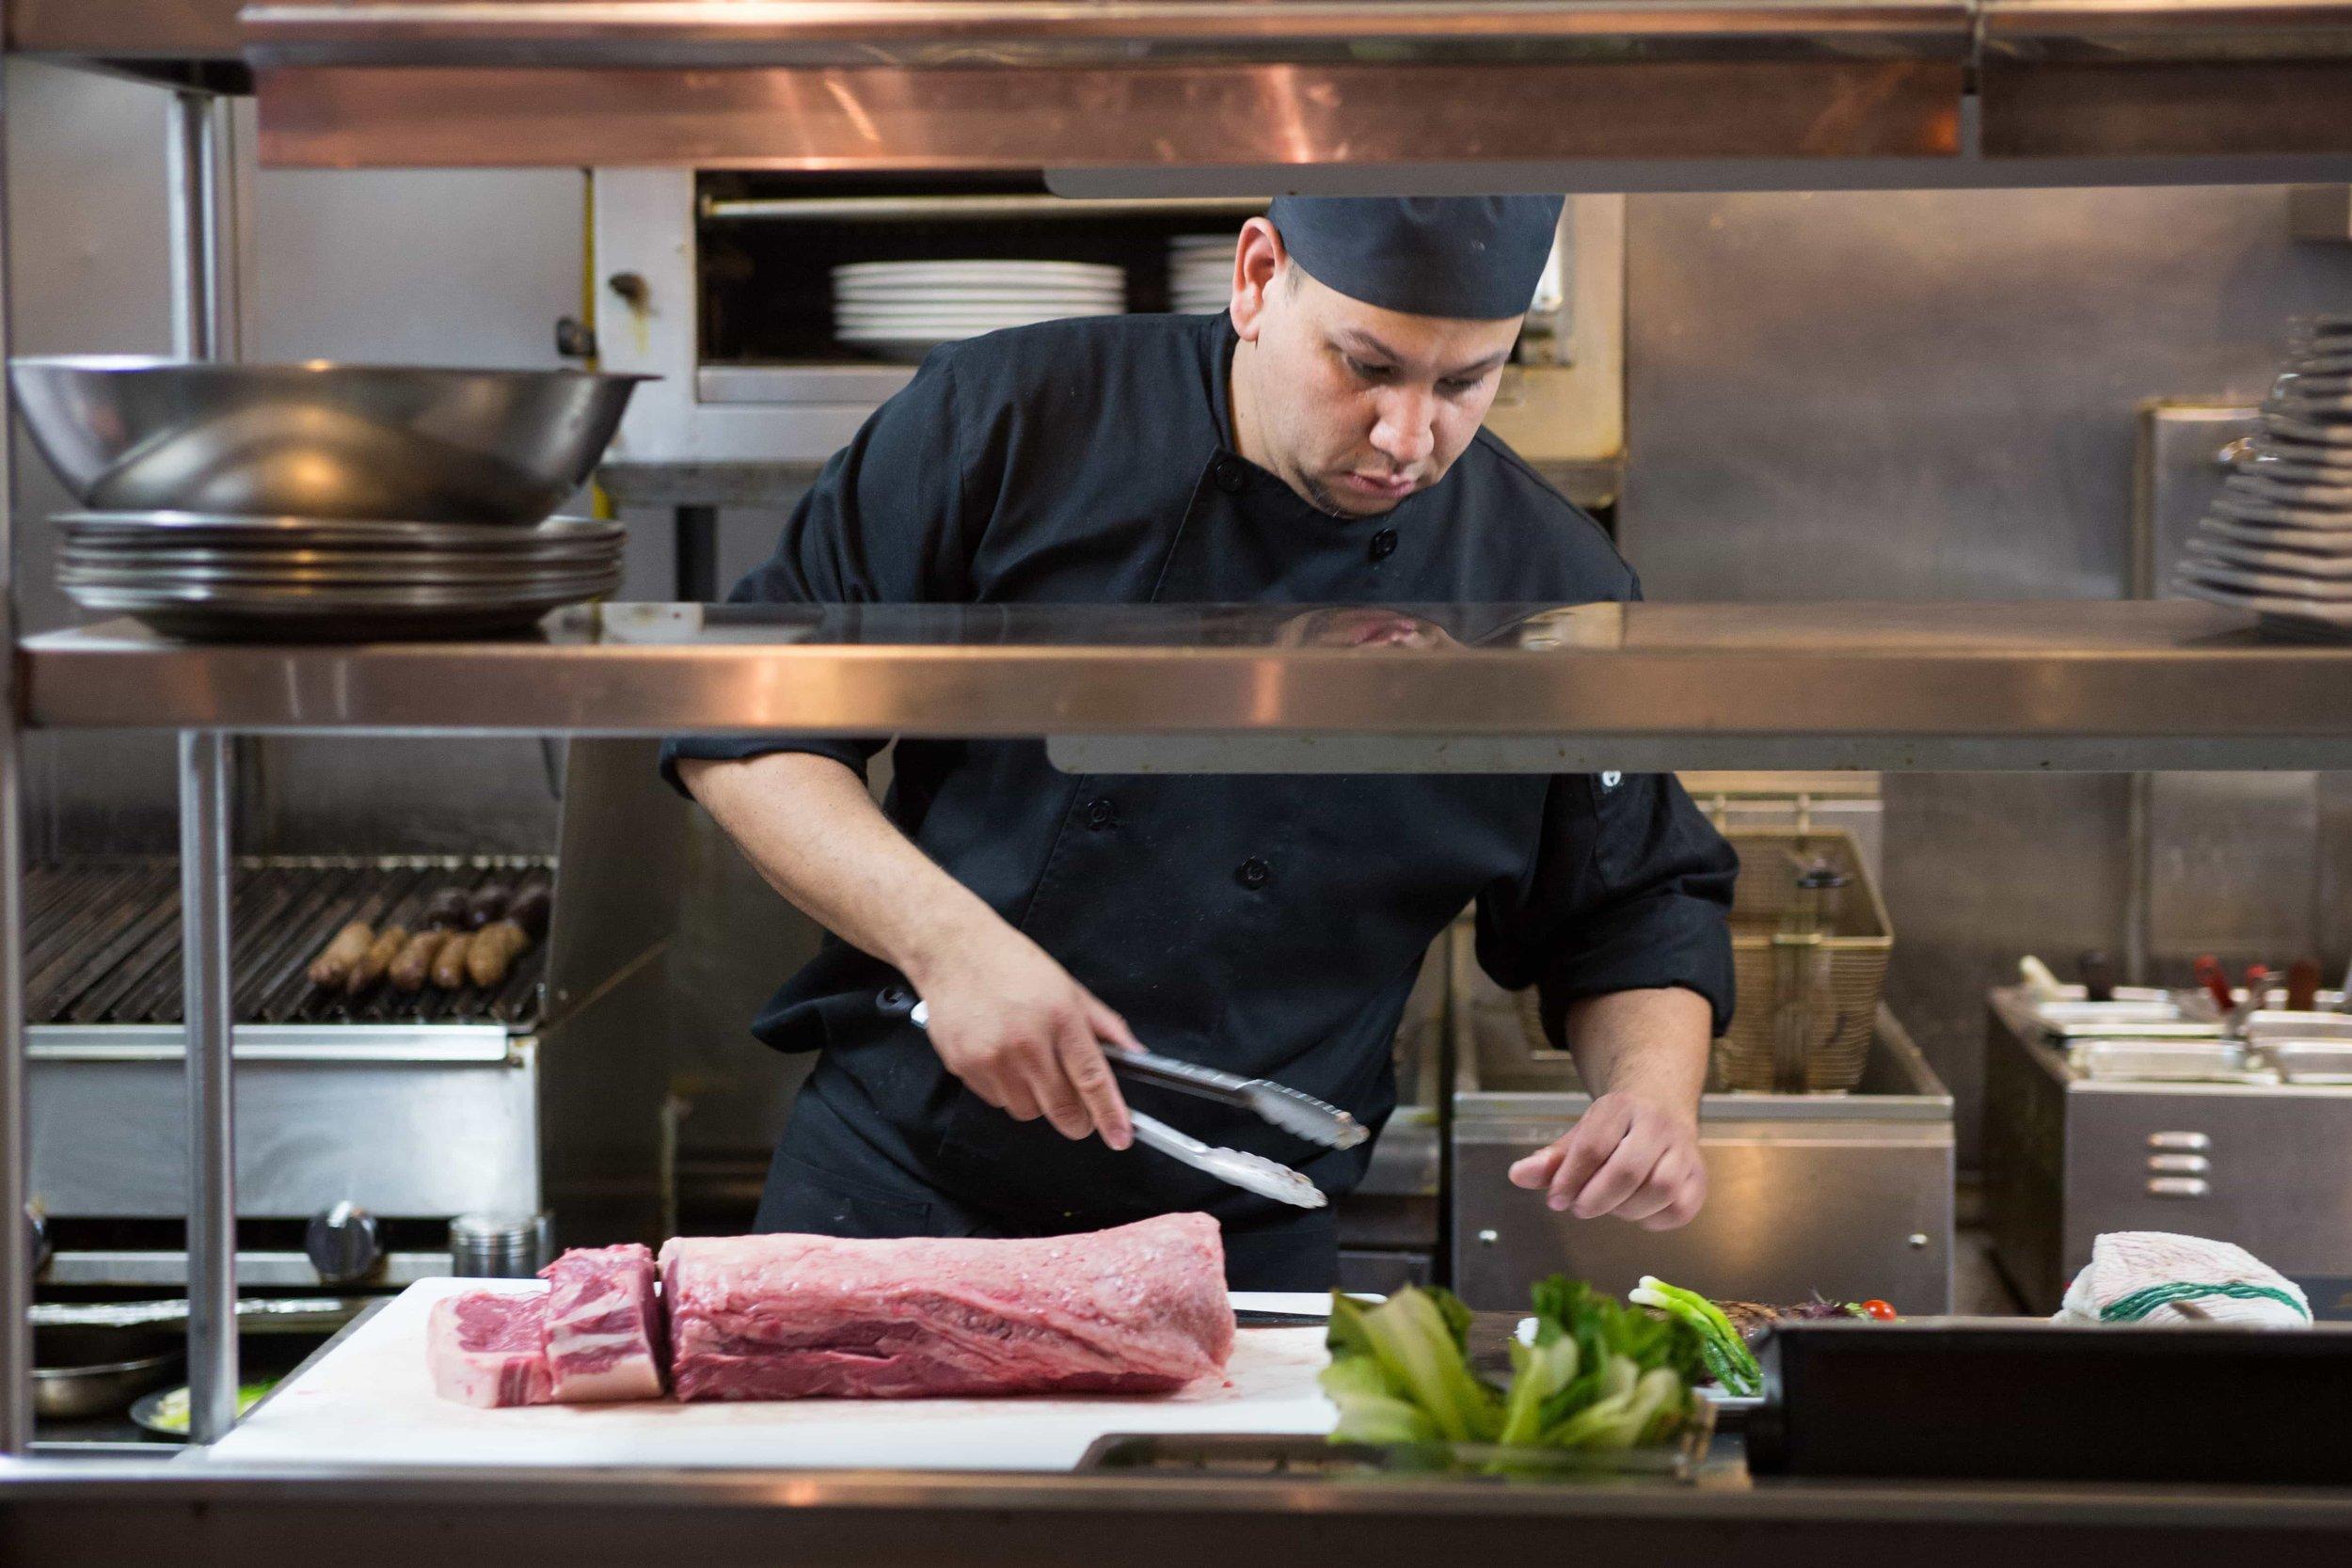 puerto-la-boca-chef-cutting-meat.jpg